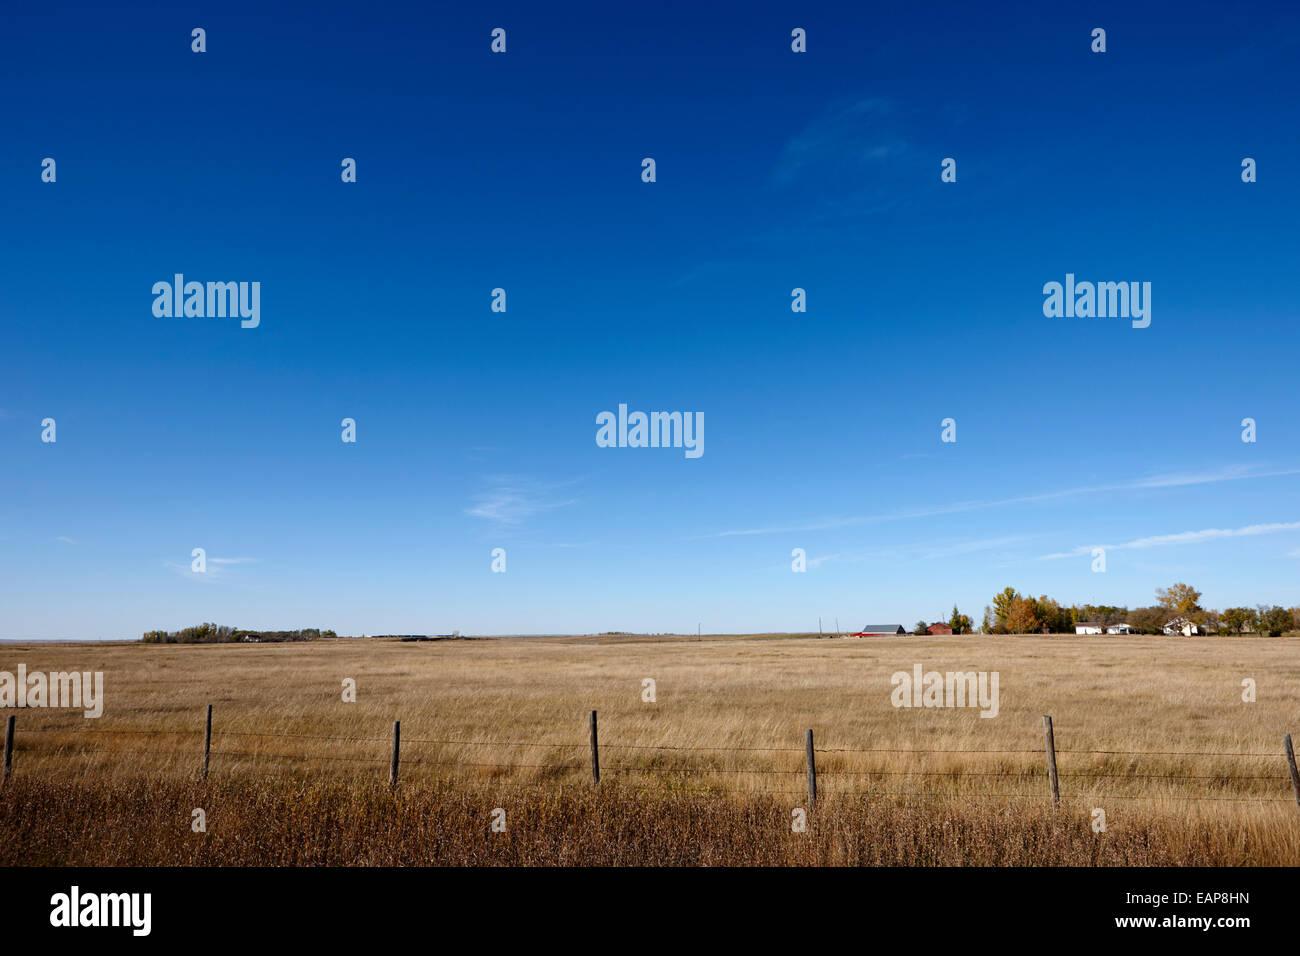 rural prairie grassland and farmland in open fields bengough Saskatchewan Canada - Stock Image